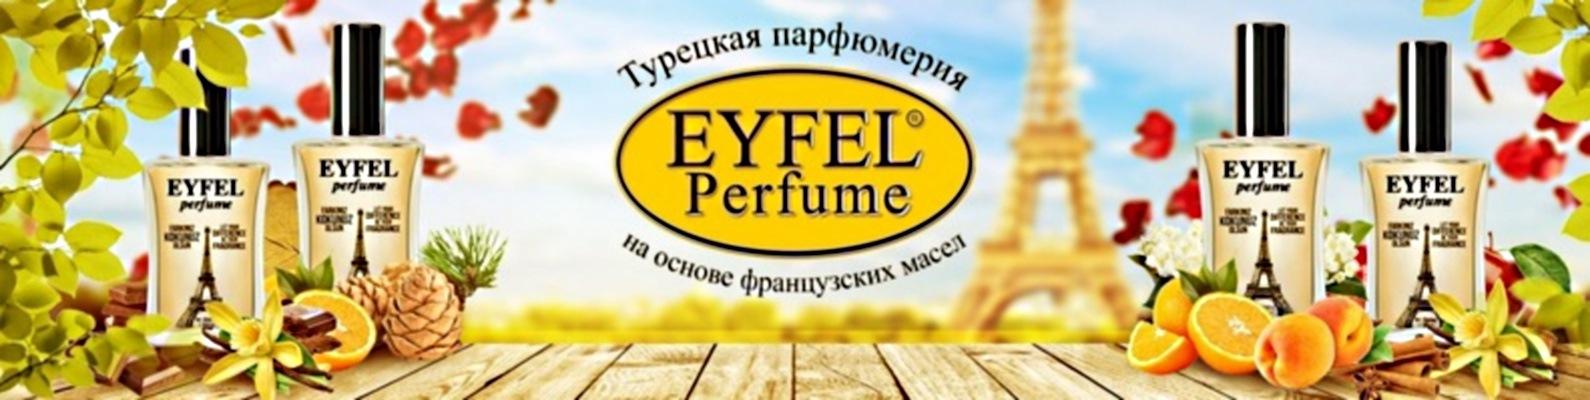 Eyfel Perfume парфюмерия бердскакадемгородок вконтакте